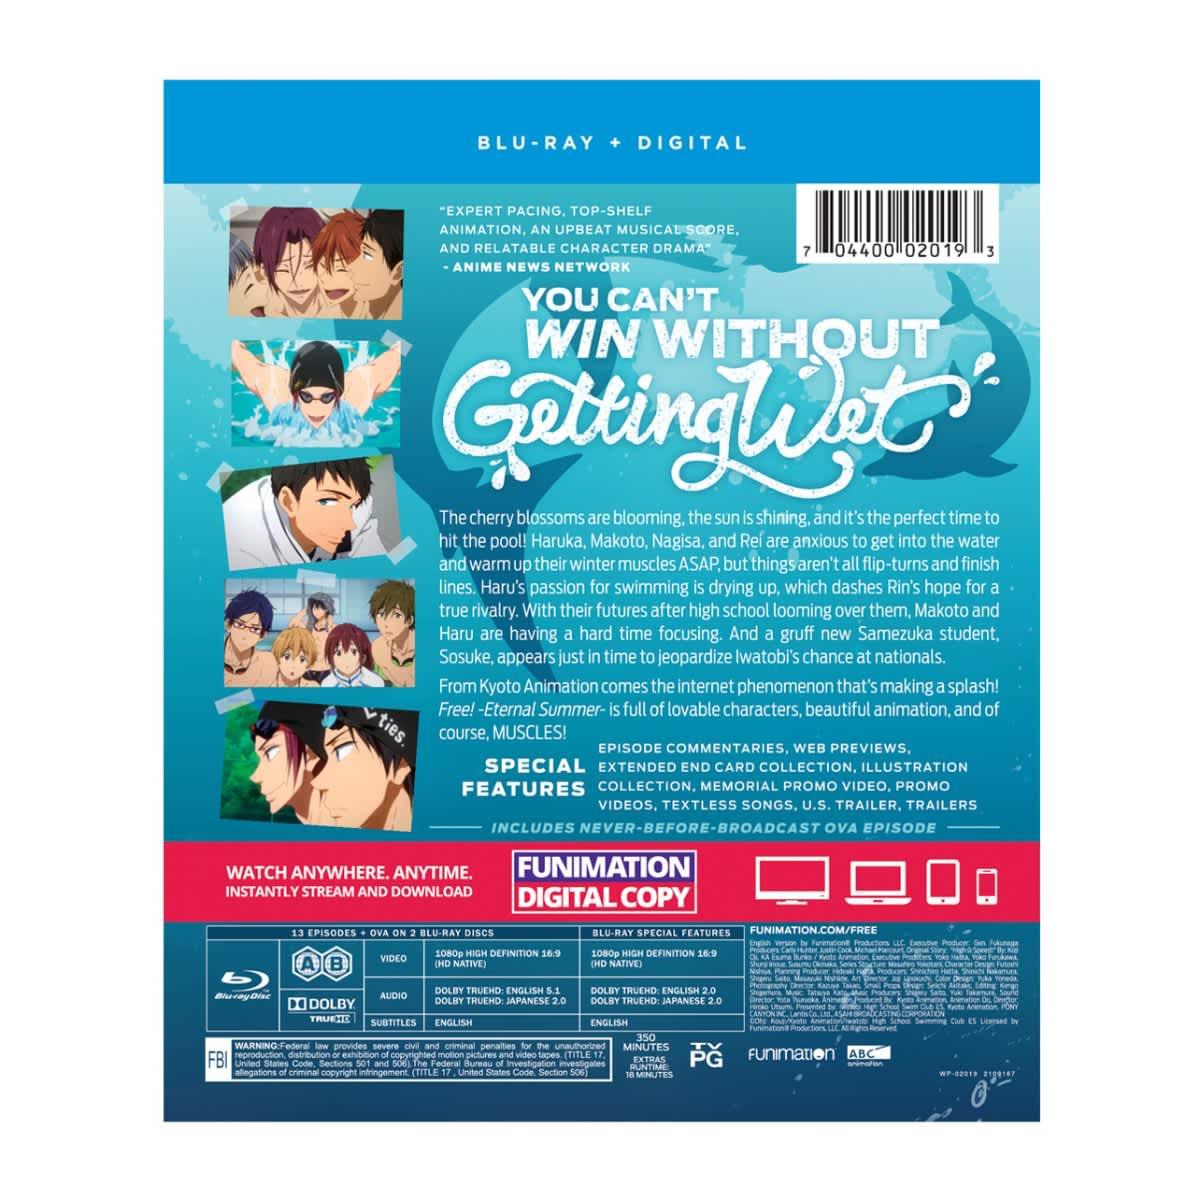 Free! Eternal Summer Season 2 Essentials Blu-ray